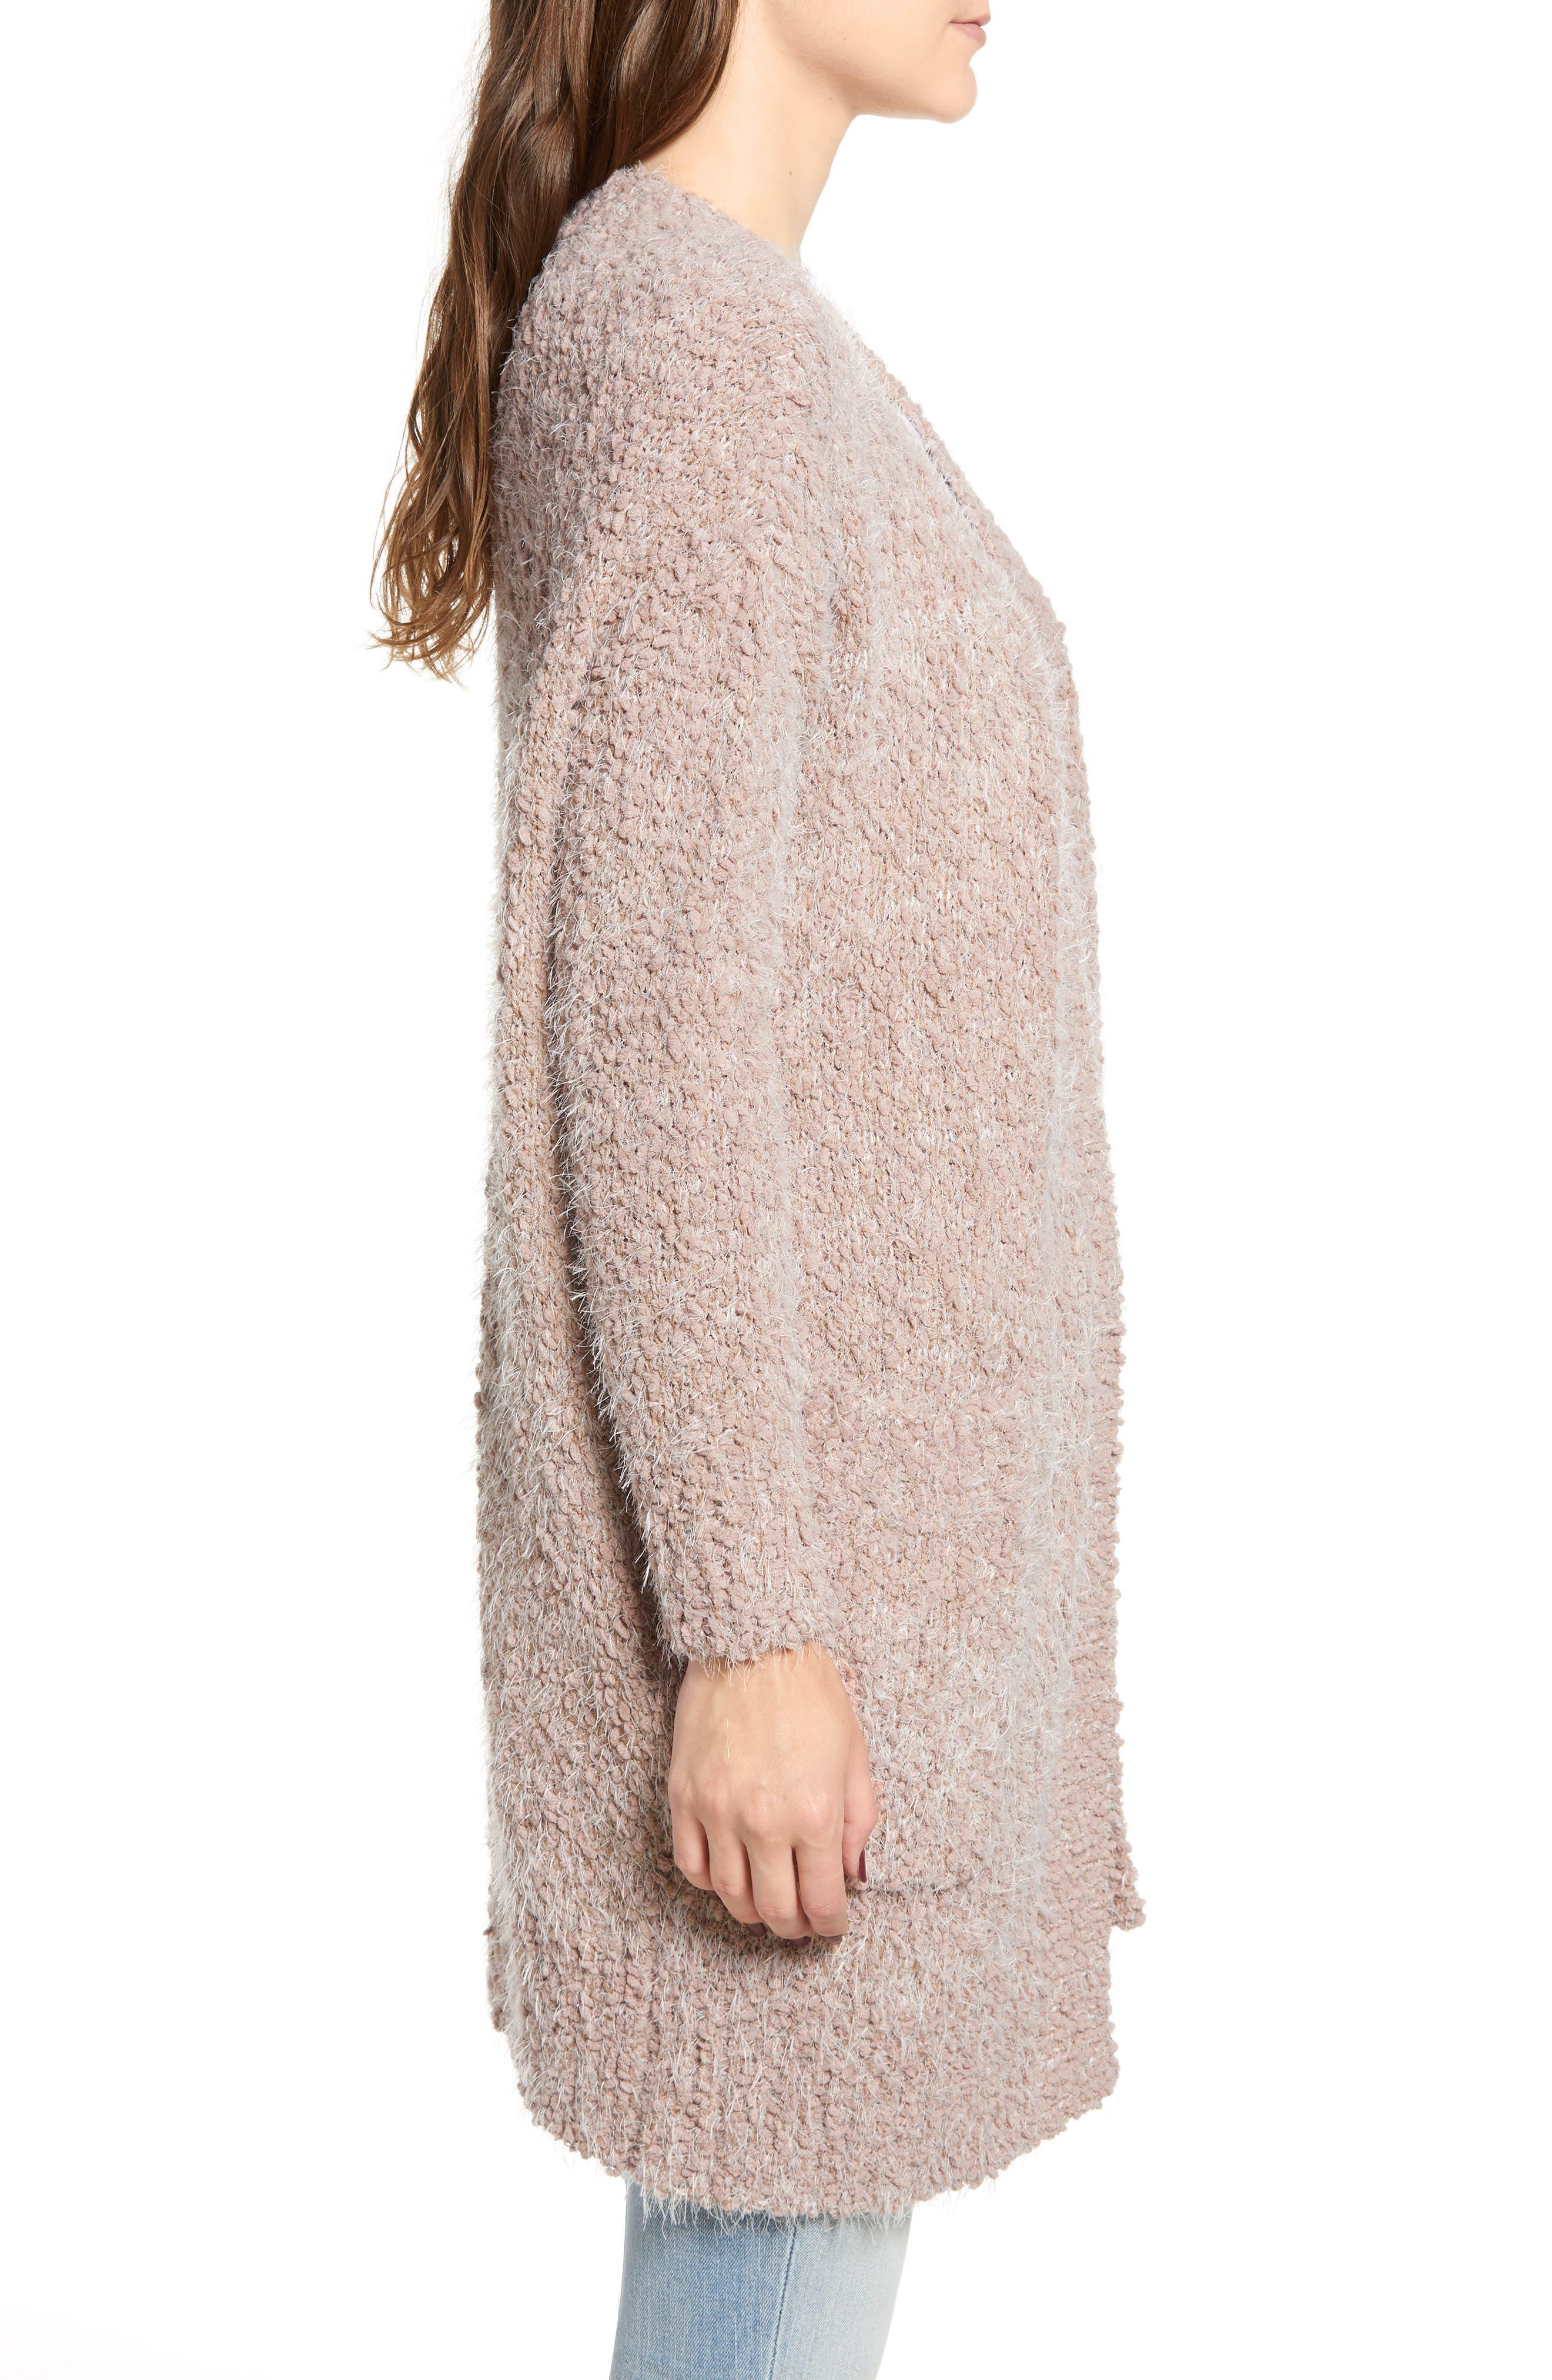 LIRA CLOTHING,                             Miranda Knit Cardigan,                             Alternate thumbnail 3, color,                             DUSTY ROSE